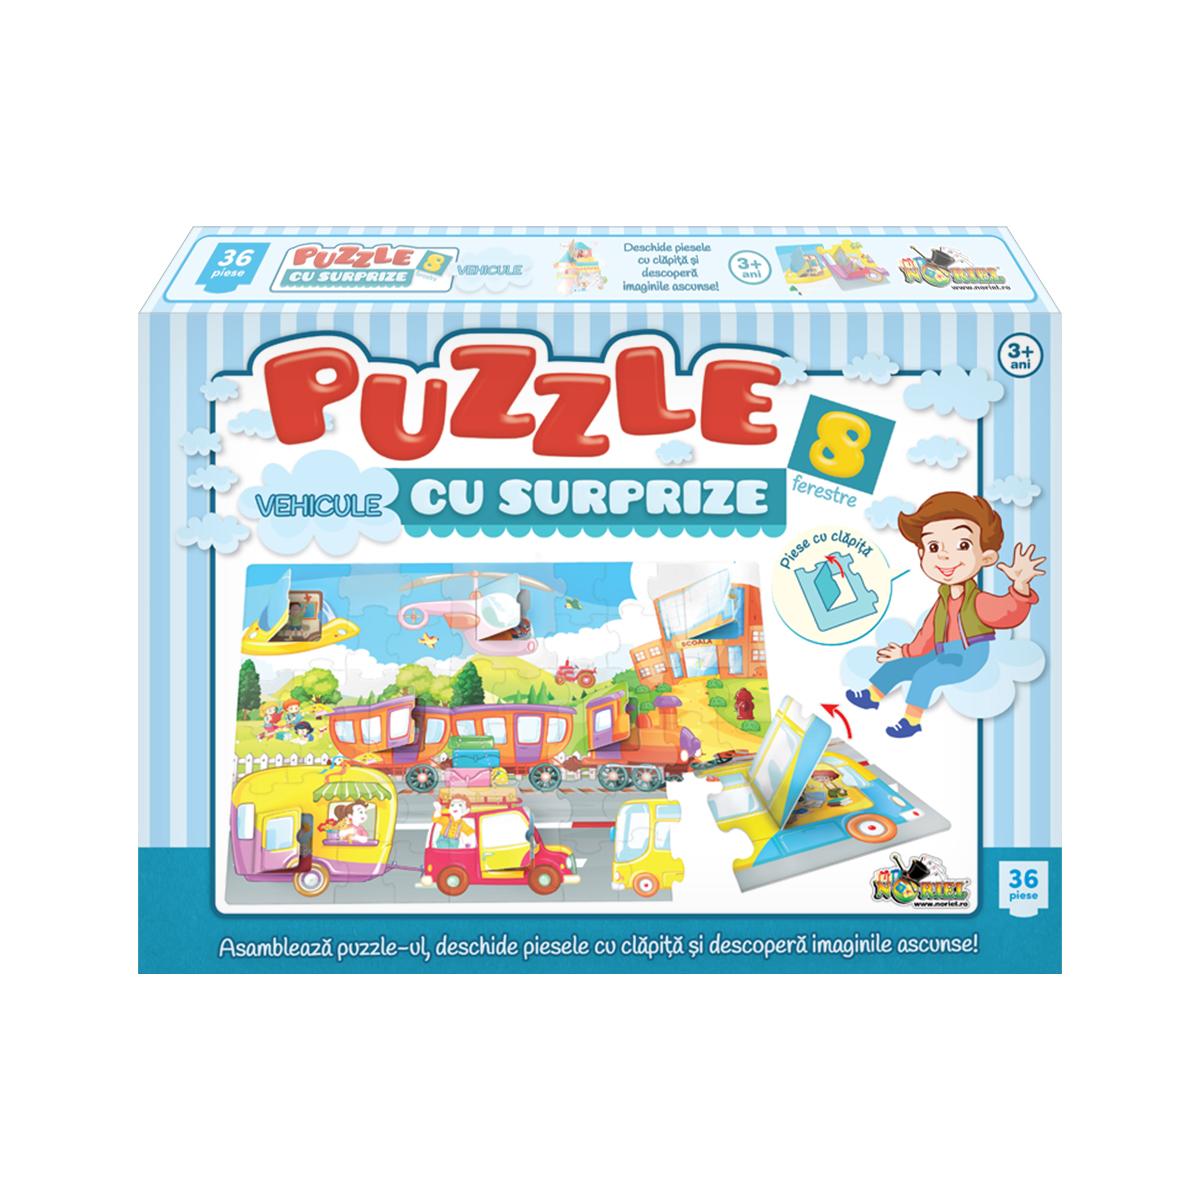 Puzzle Noriel - Vehicule cu Surprize. 36 piese